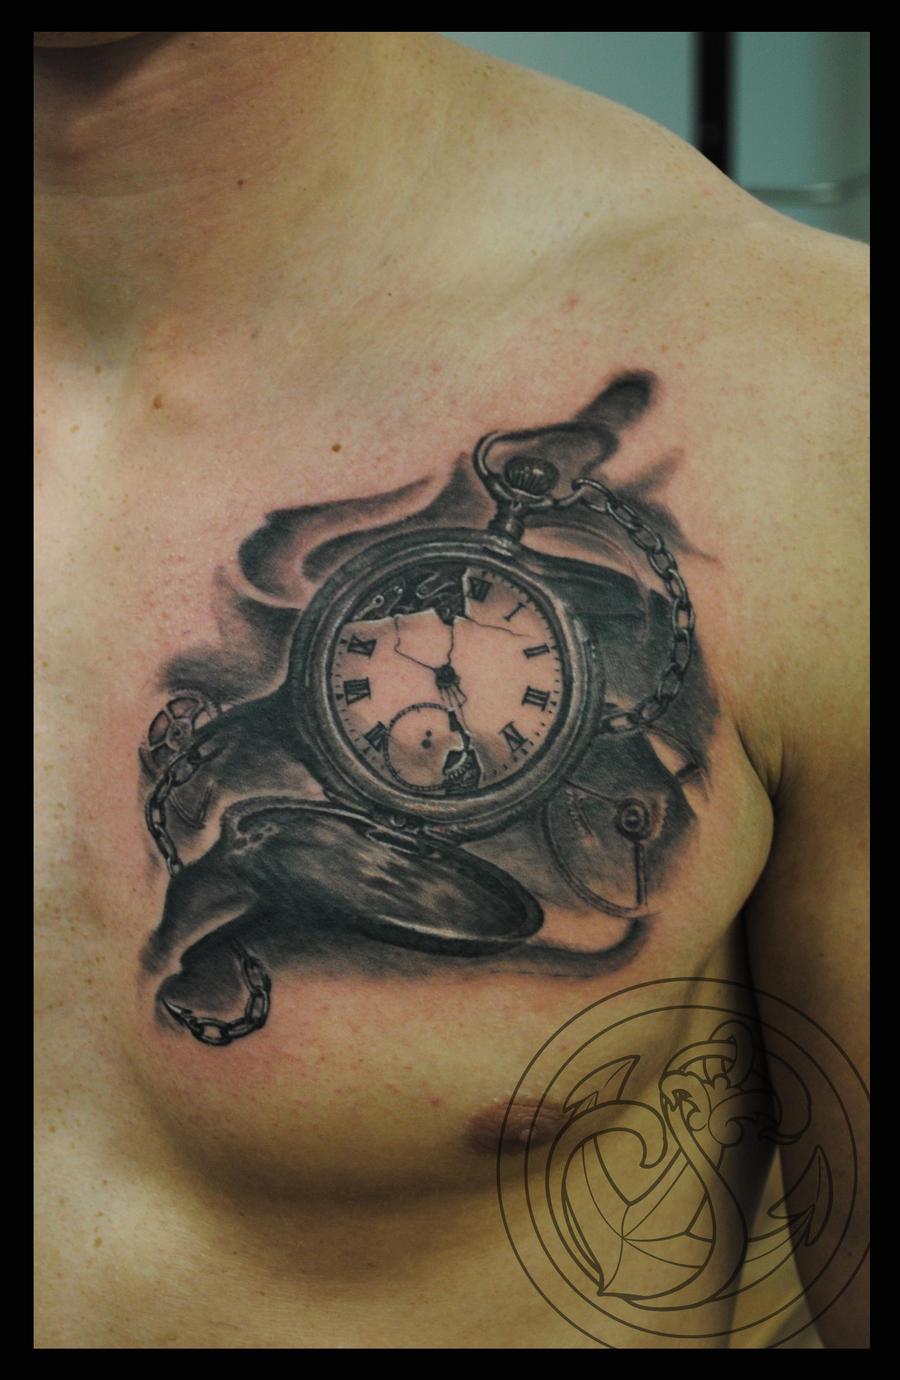 pocket watch by RosaroterPanda on DeviantArt